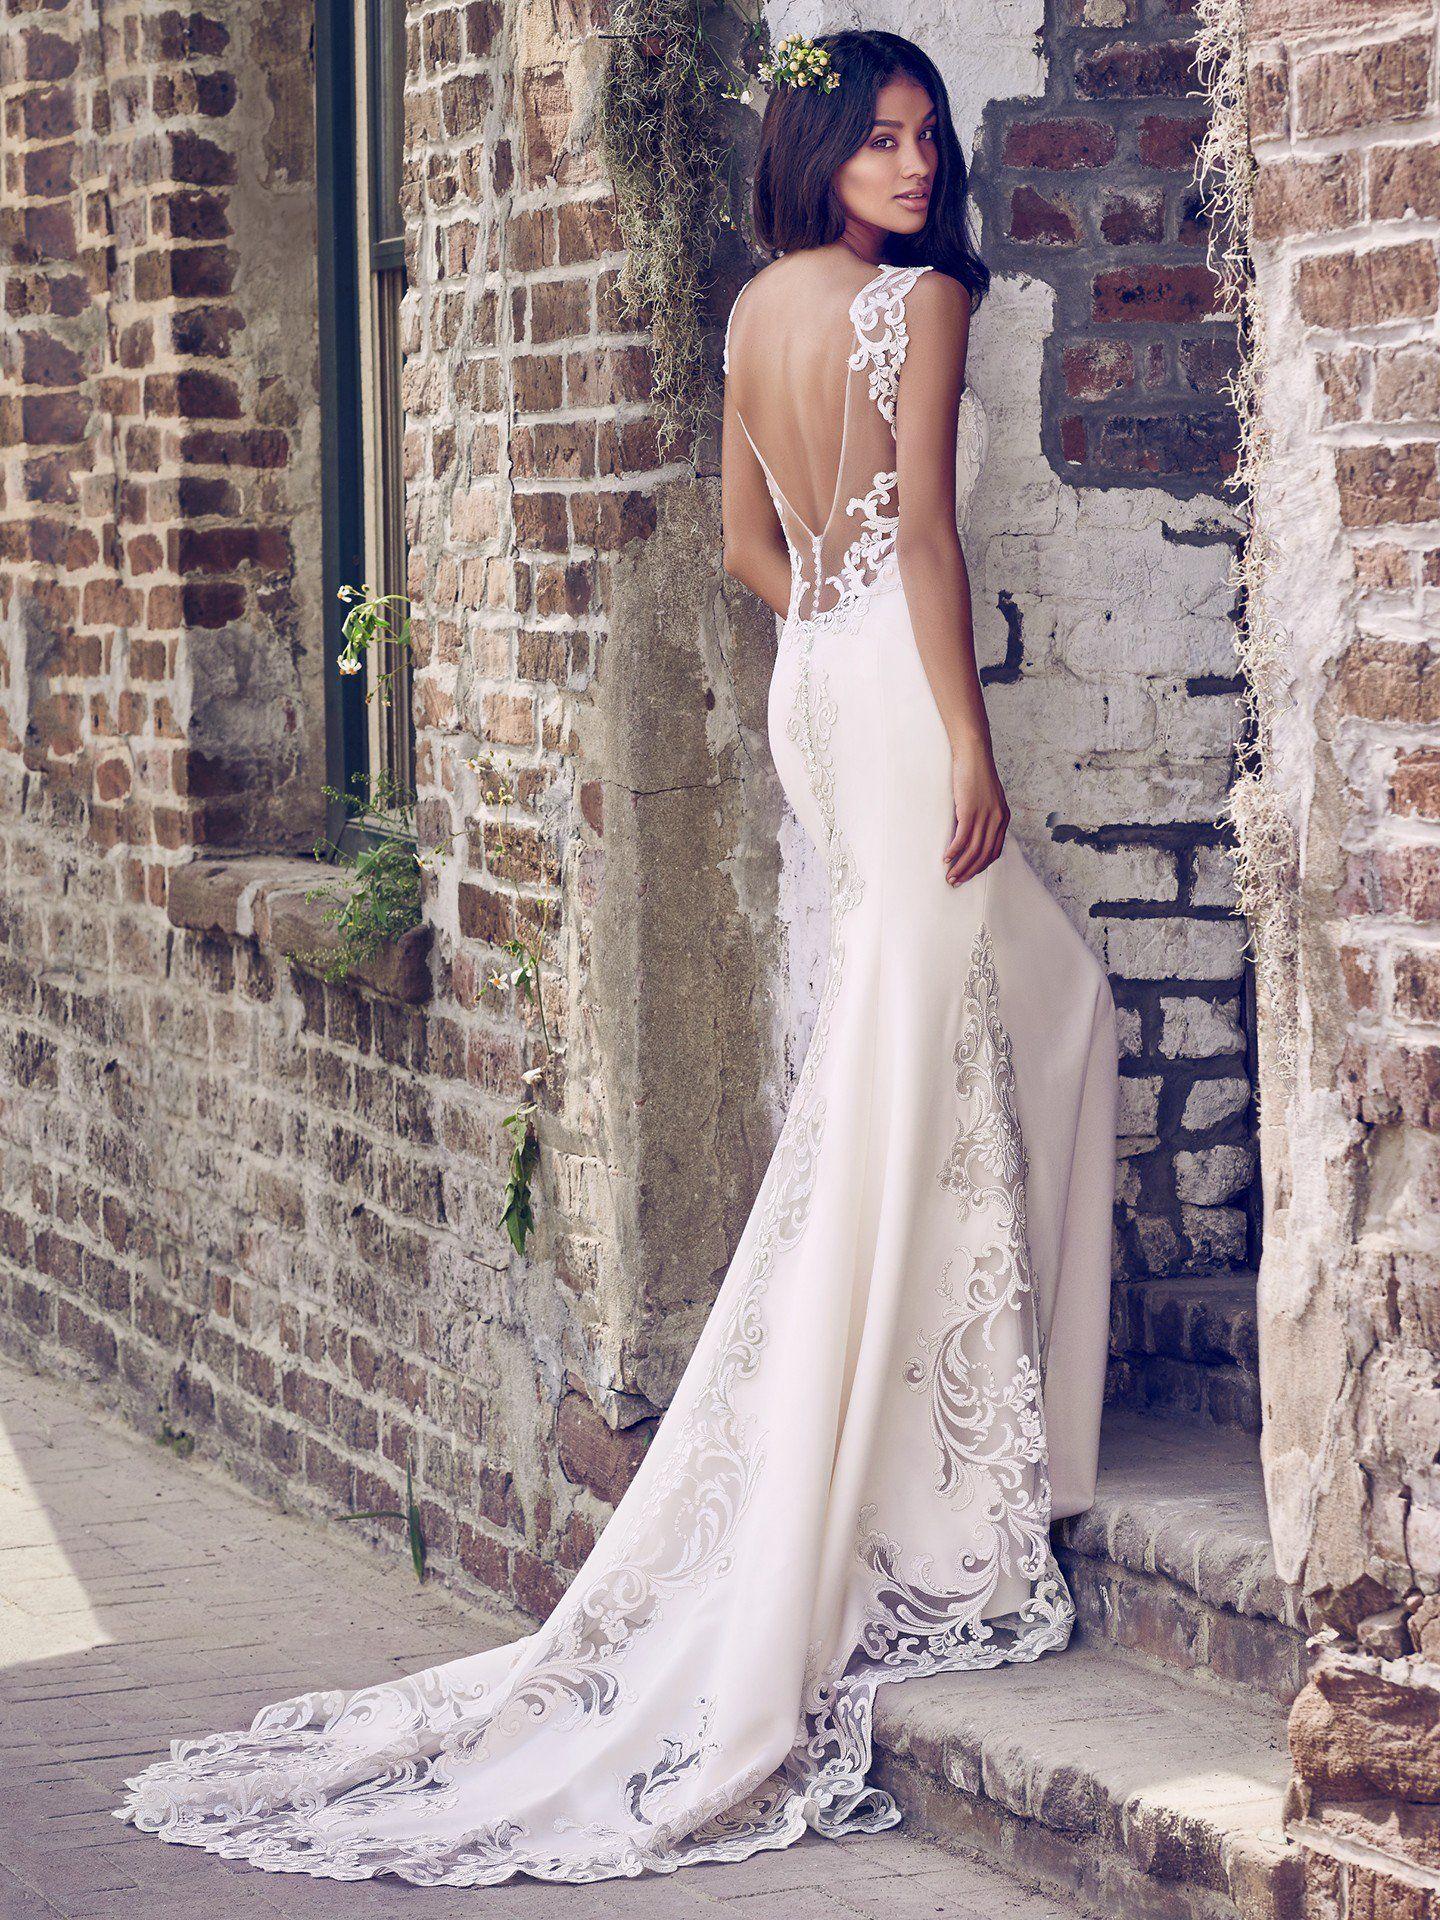 4b9210f6 Maggie Sottero - VERONICA, Embroidered lace motifs adorn the illusion  cutout train, illusion scoop back, illusion straps, and illusion V-neckline  in this ...